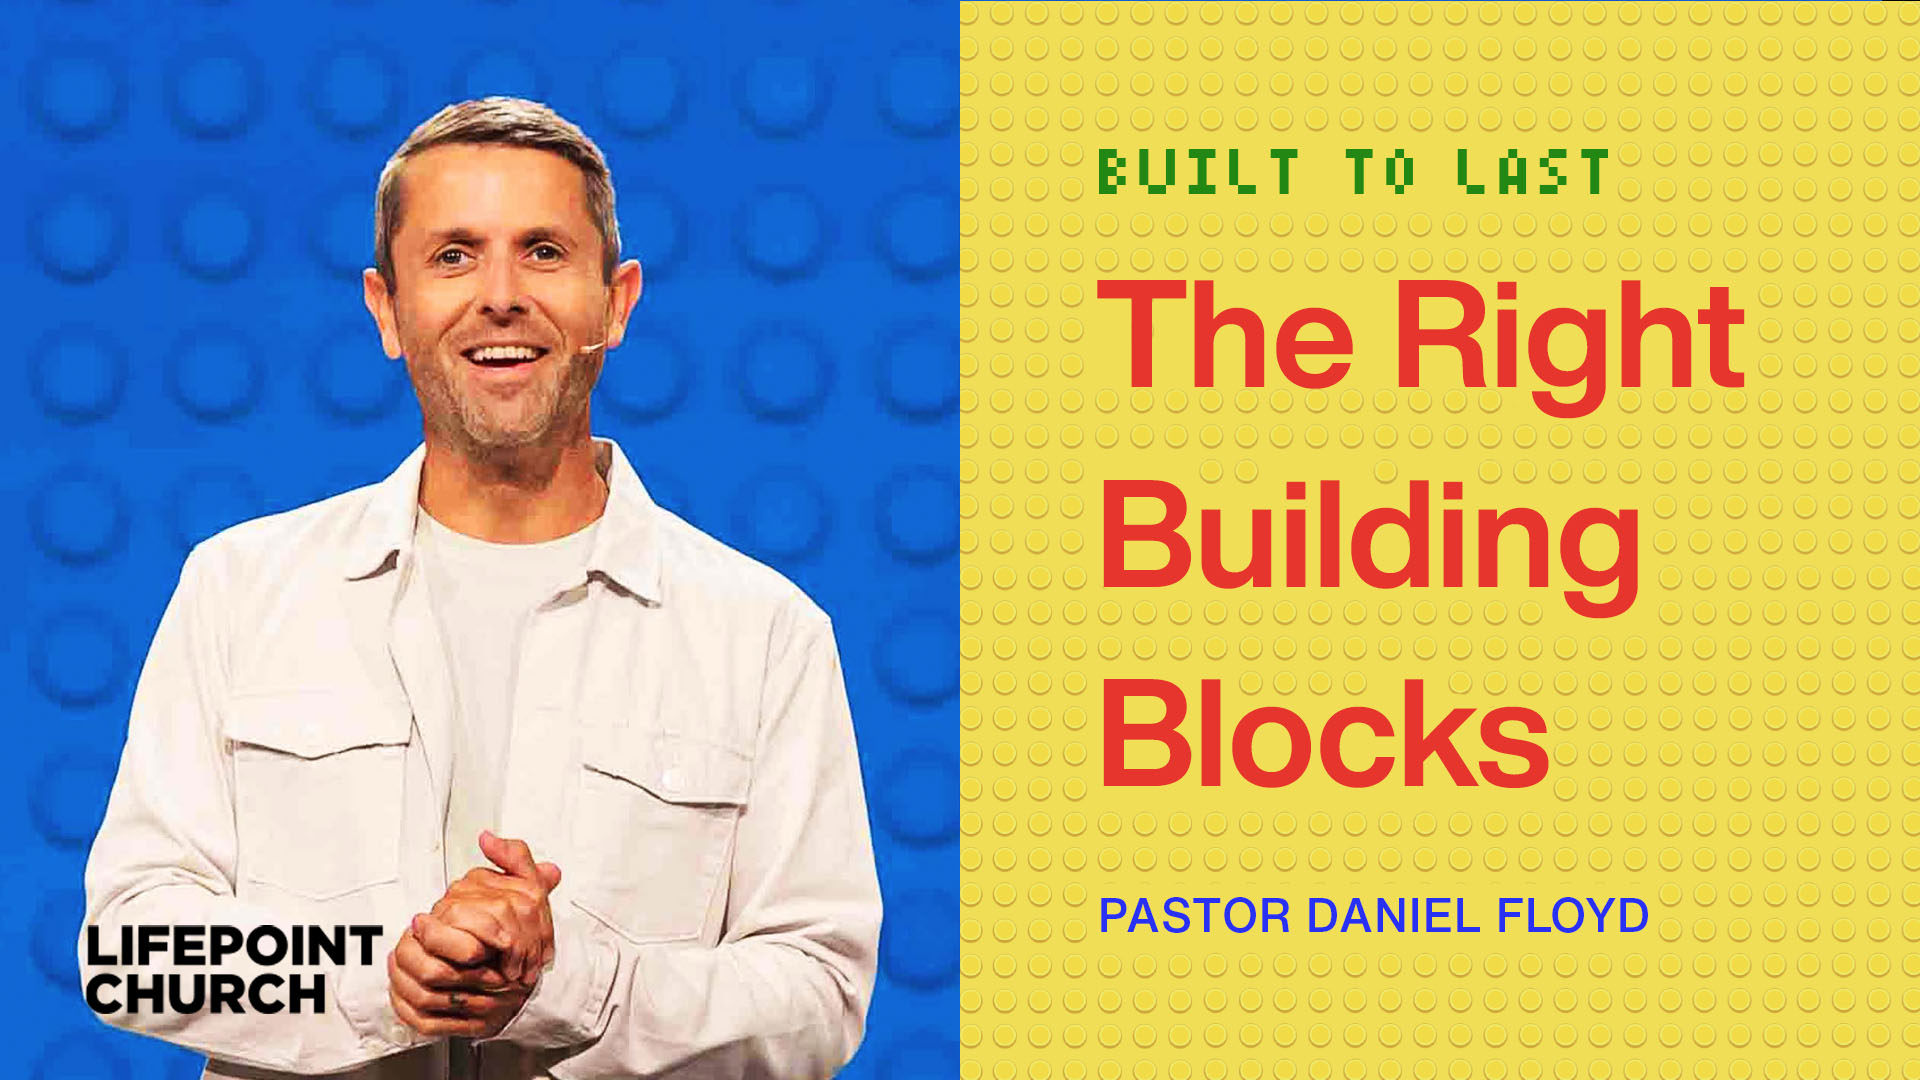 The Right Building Blocks